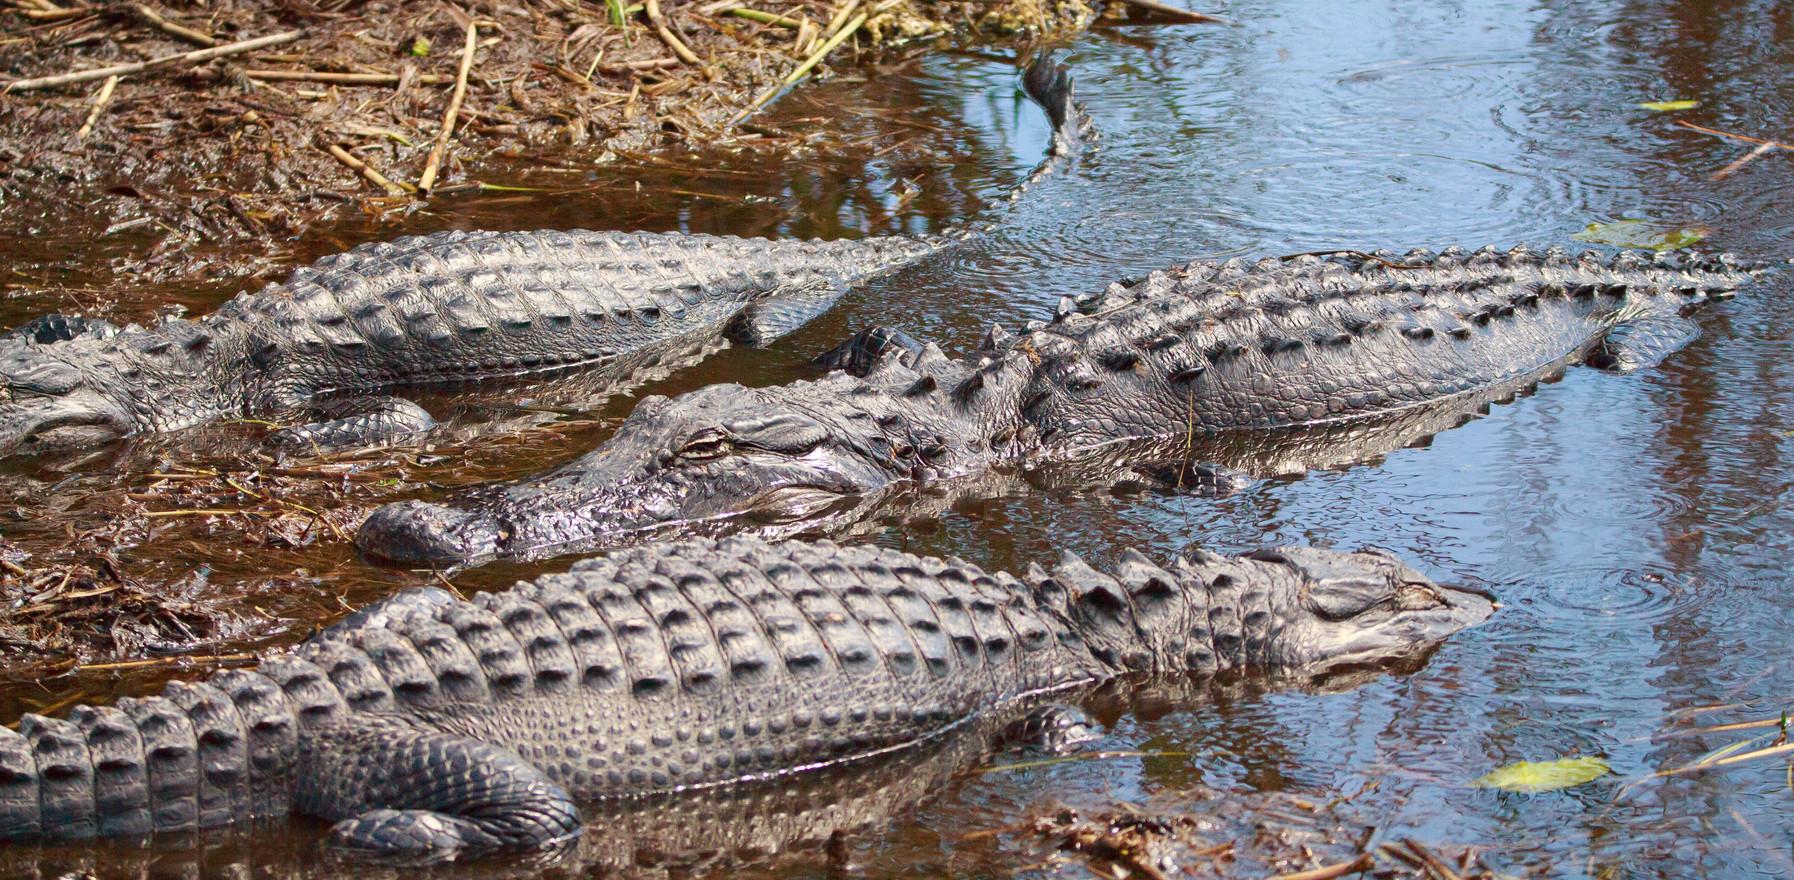 Alligators Basking